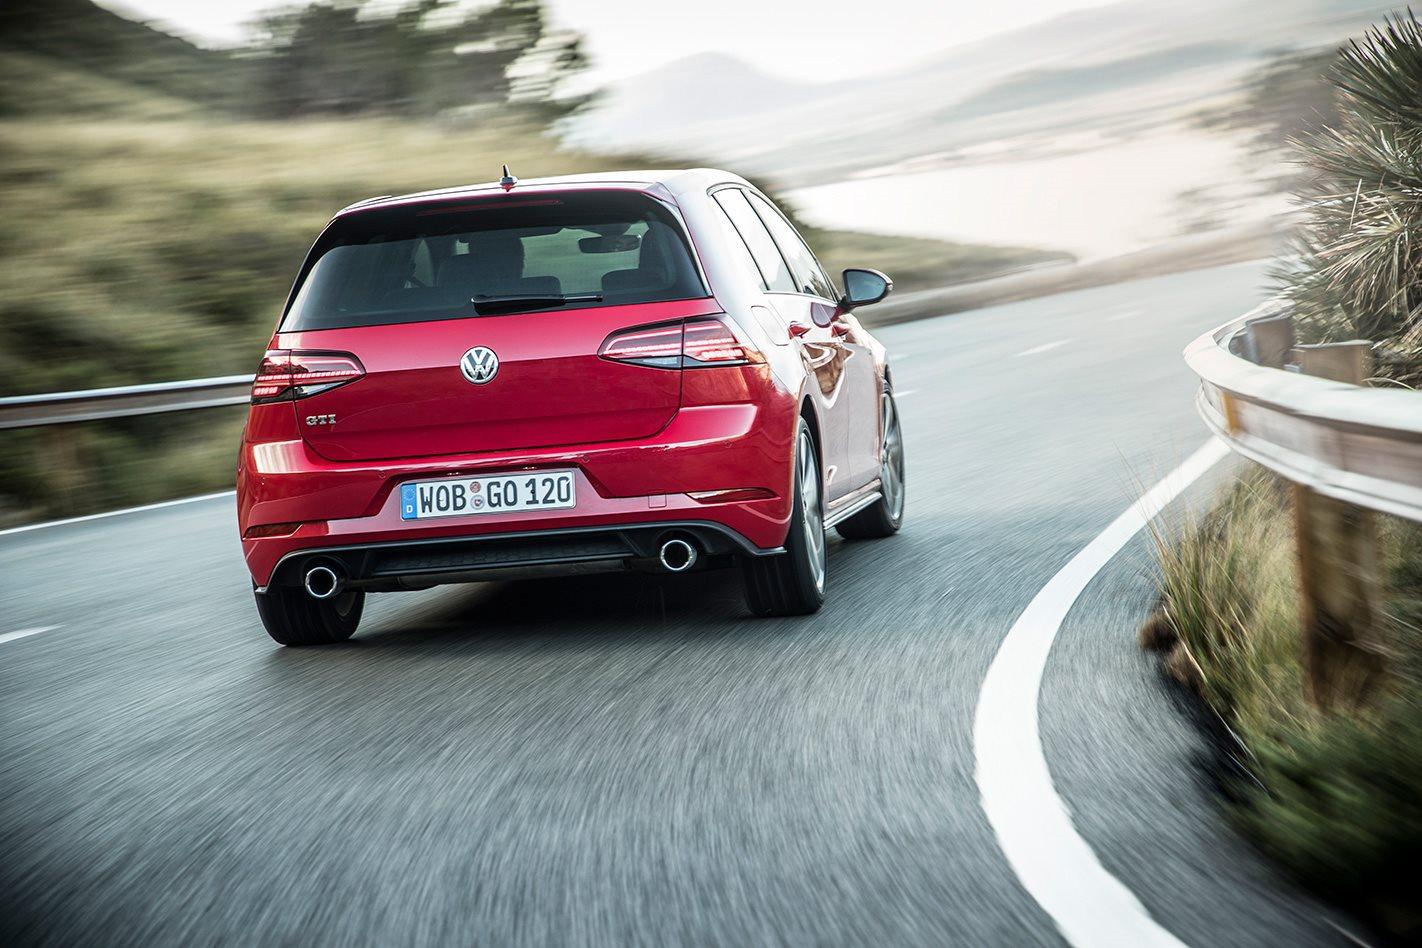 2017 Volkswagen Golf GTI Mk7 5 Review